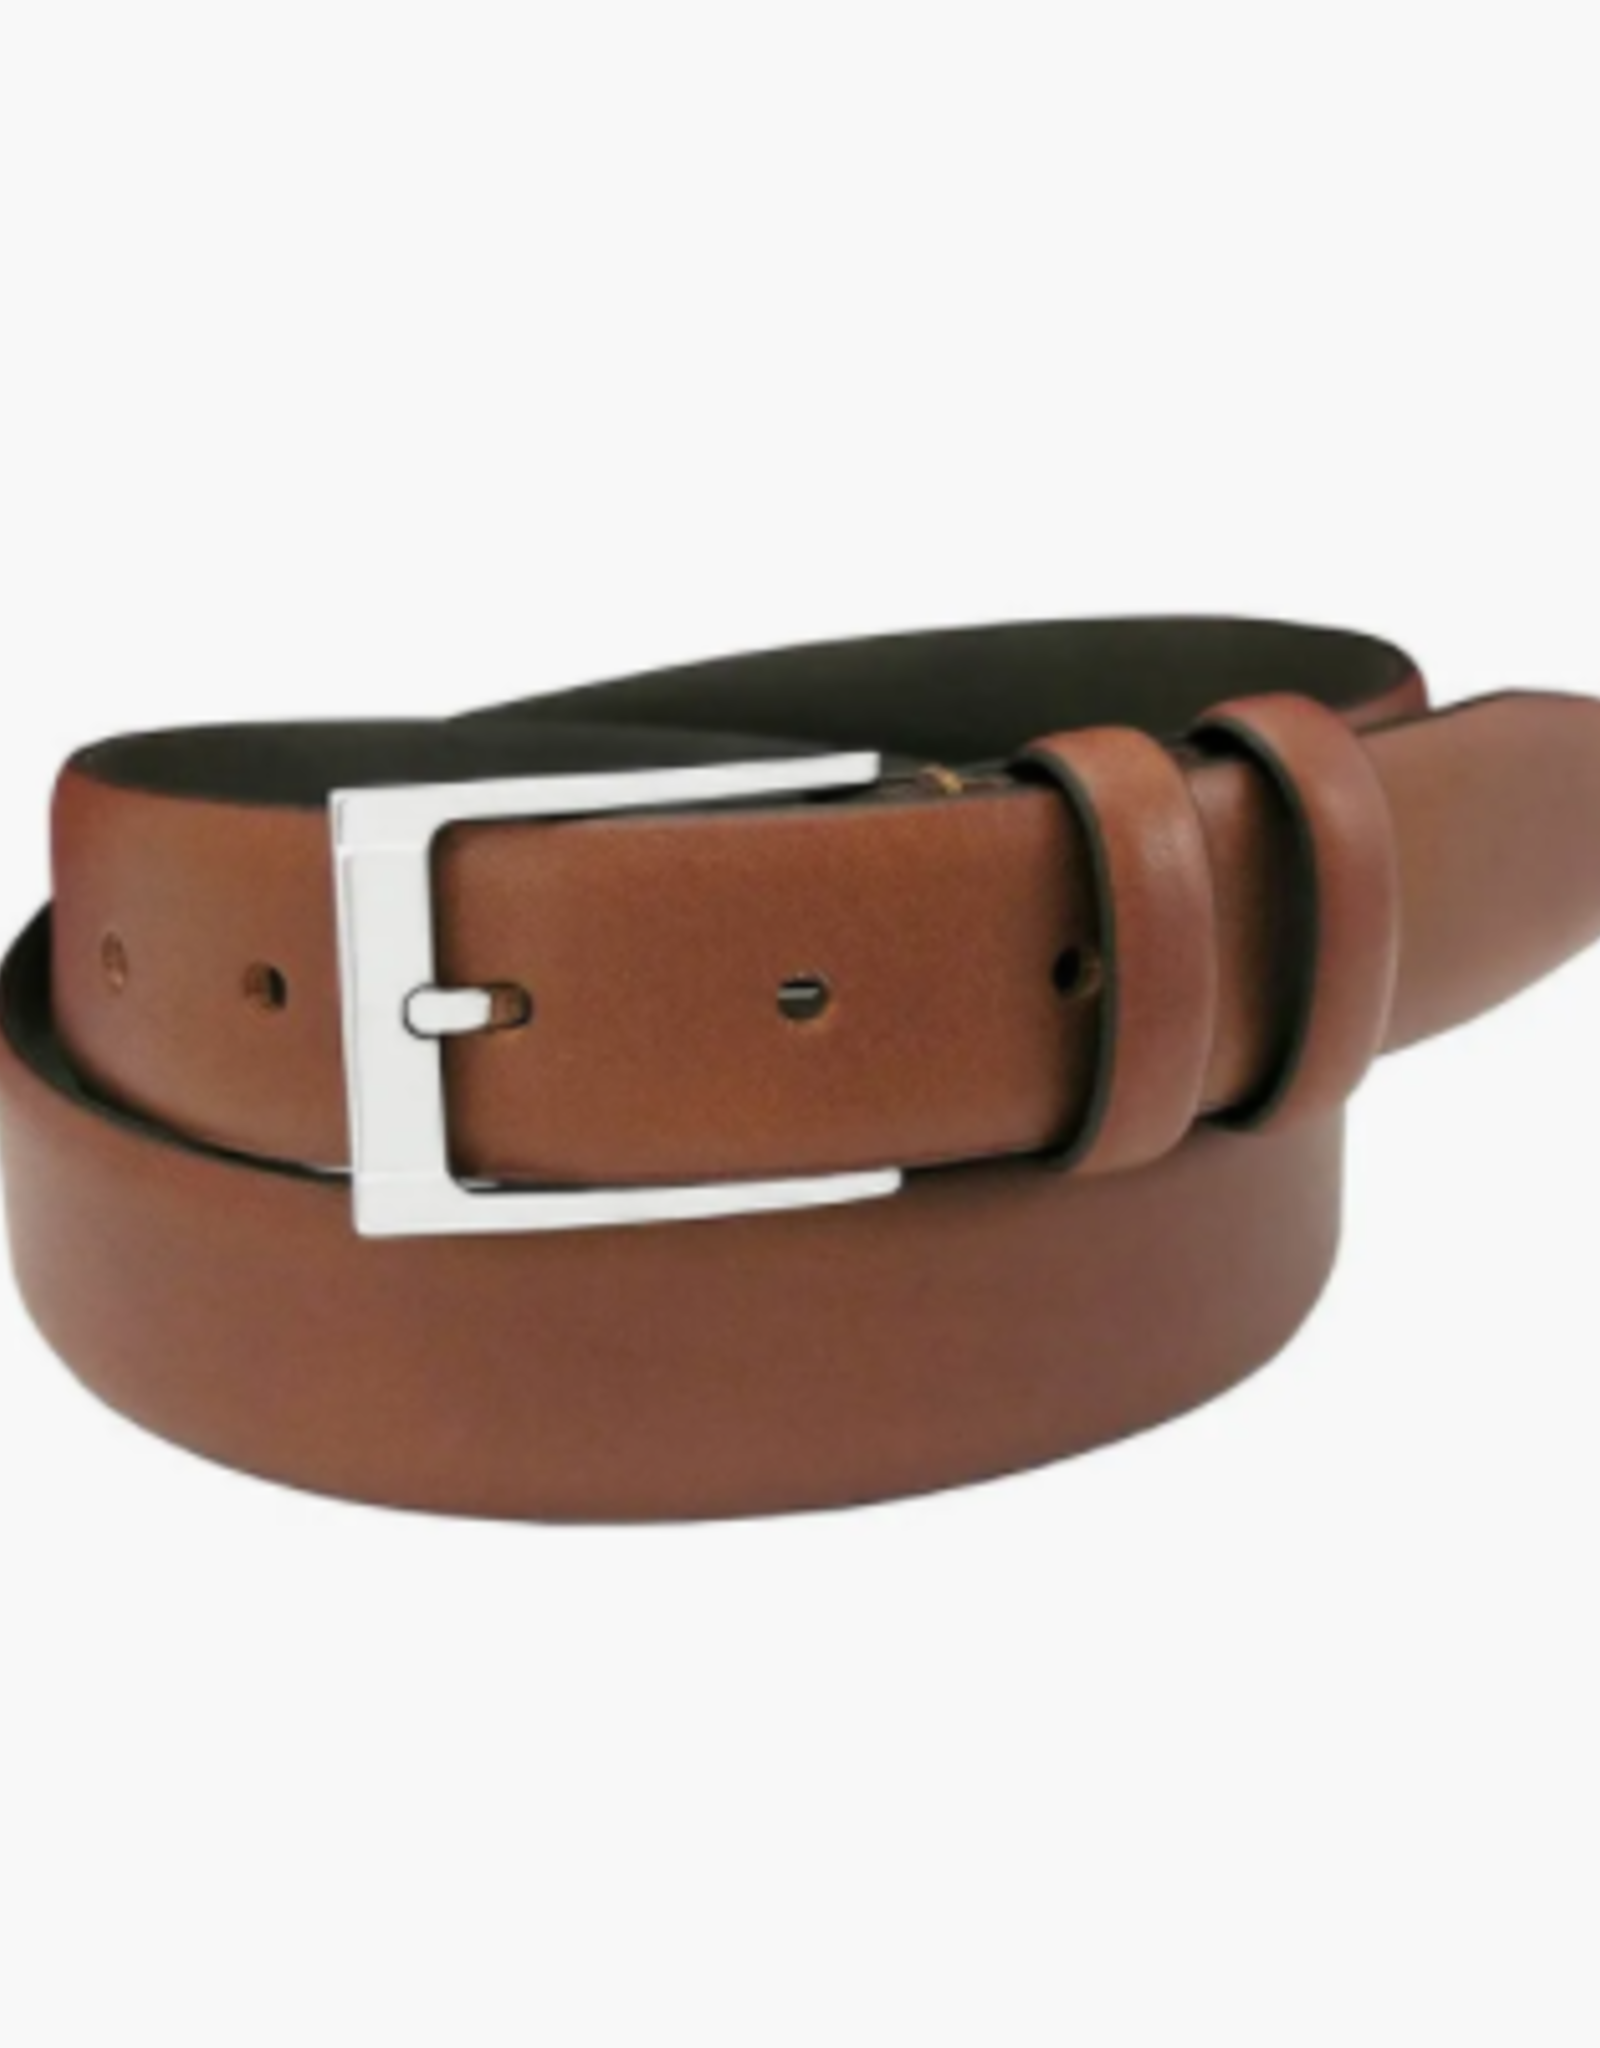 GAUTHIER Genuine Italian Leather Belt